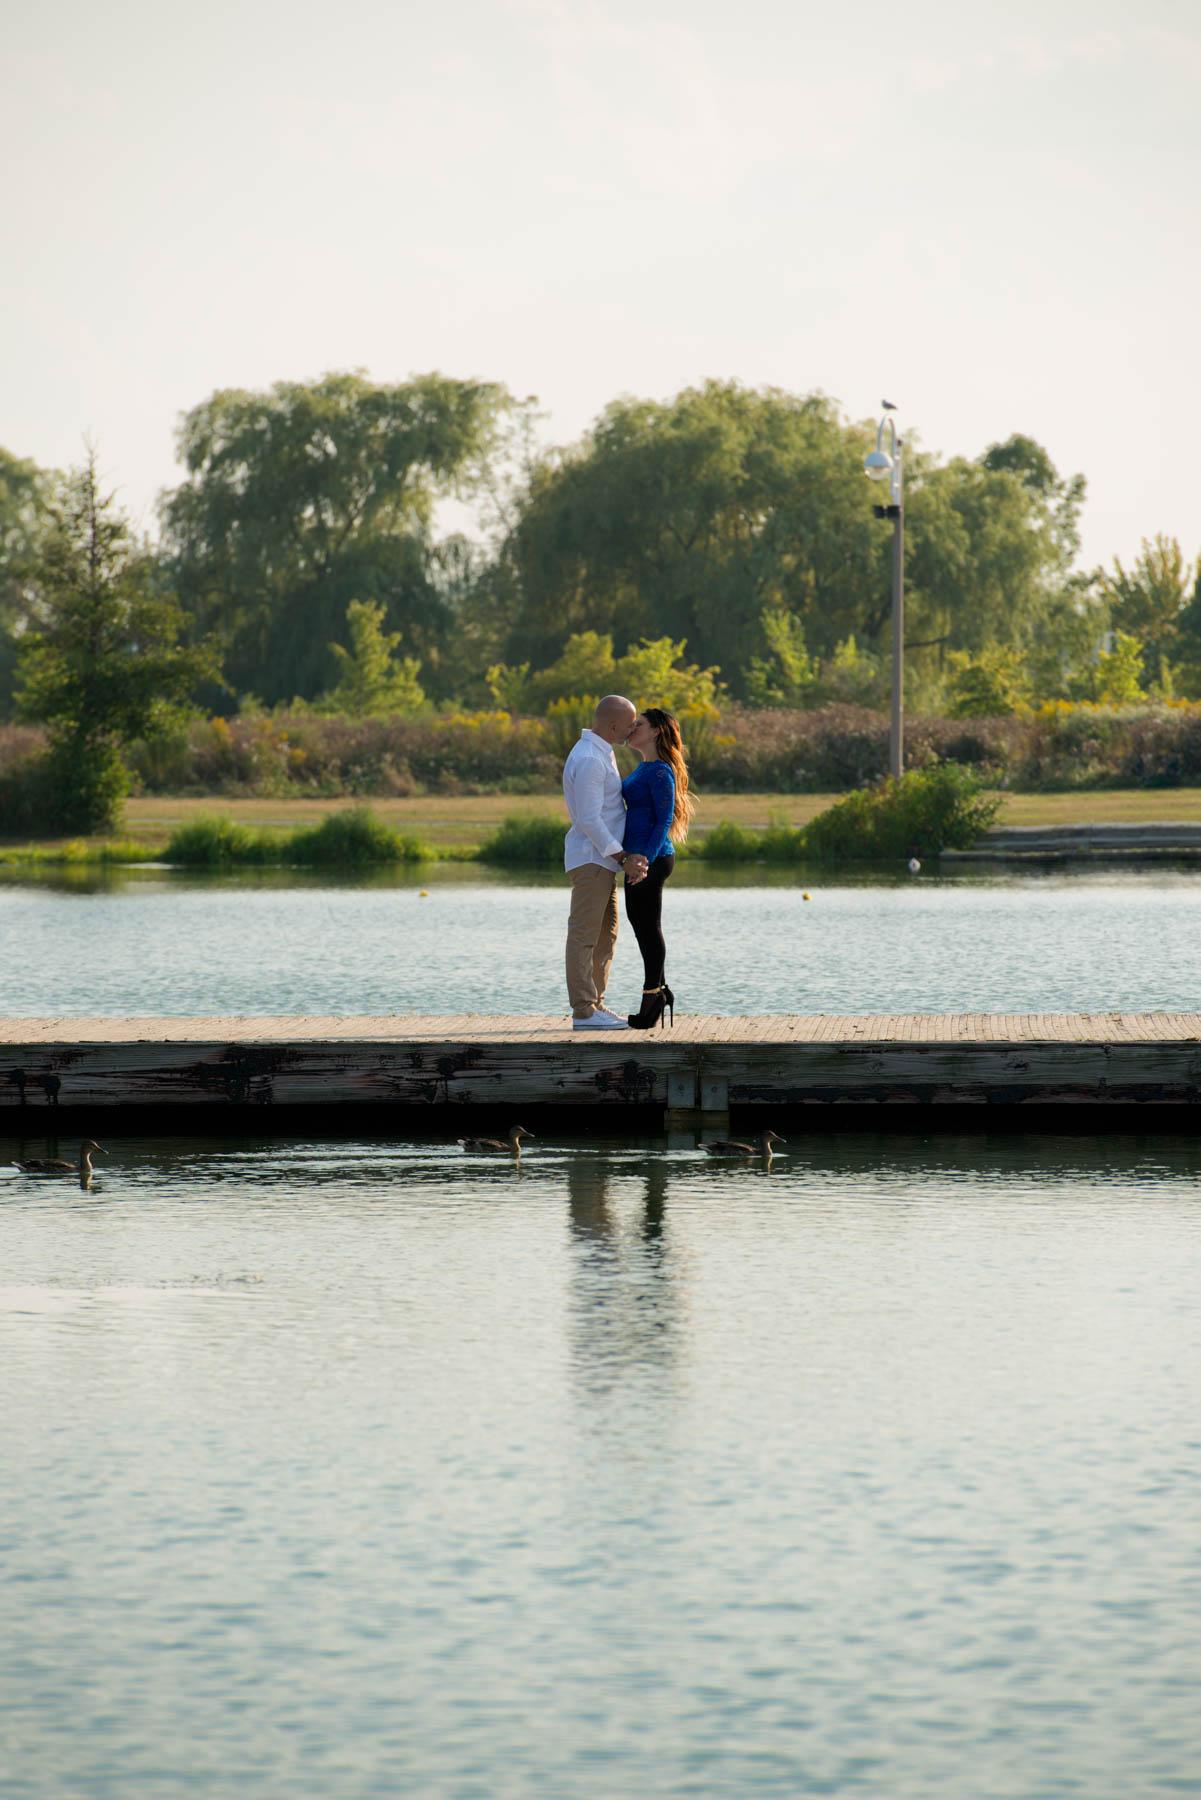 018 - Engagement FL Humber Bay Park - Toronto